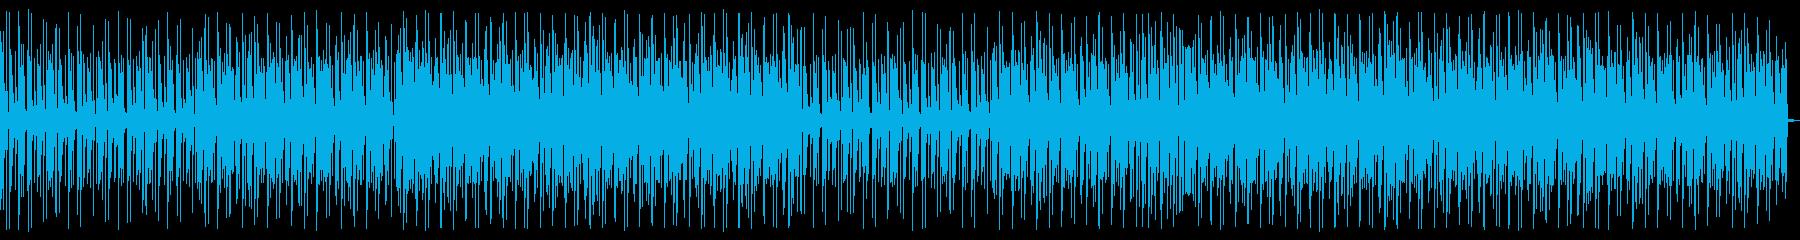 Digital. graphic. Techno_5's reproduced waveform